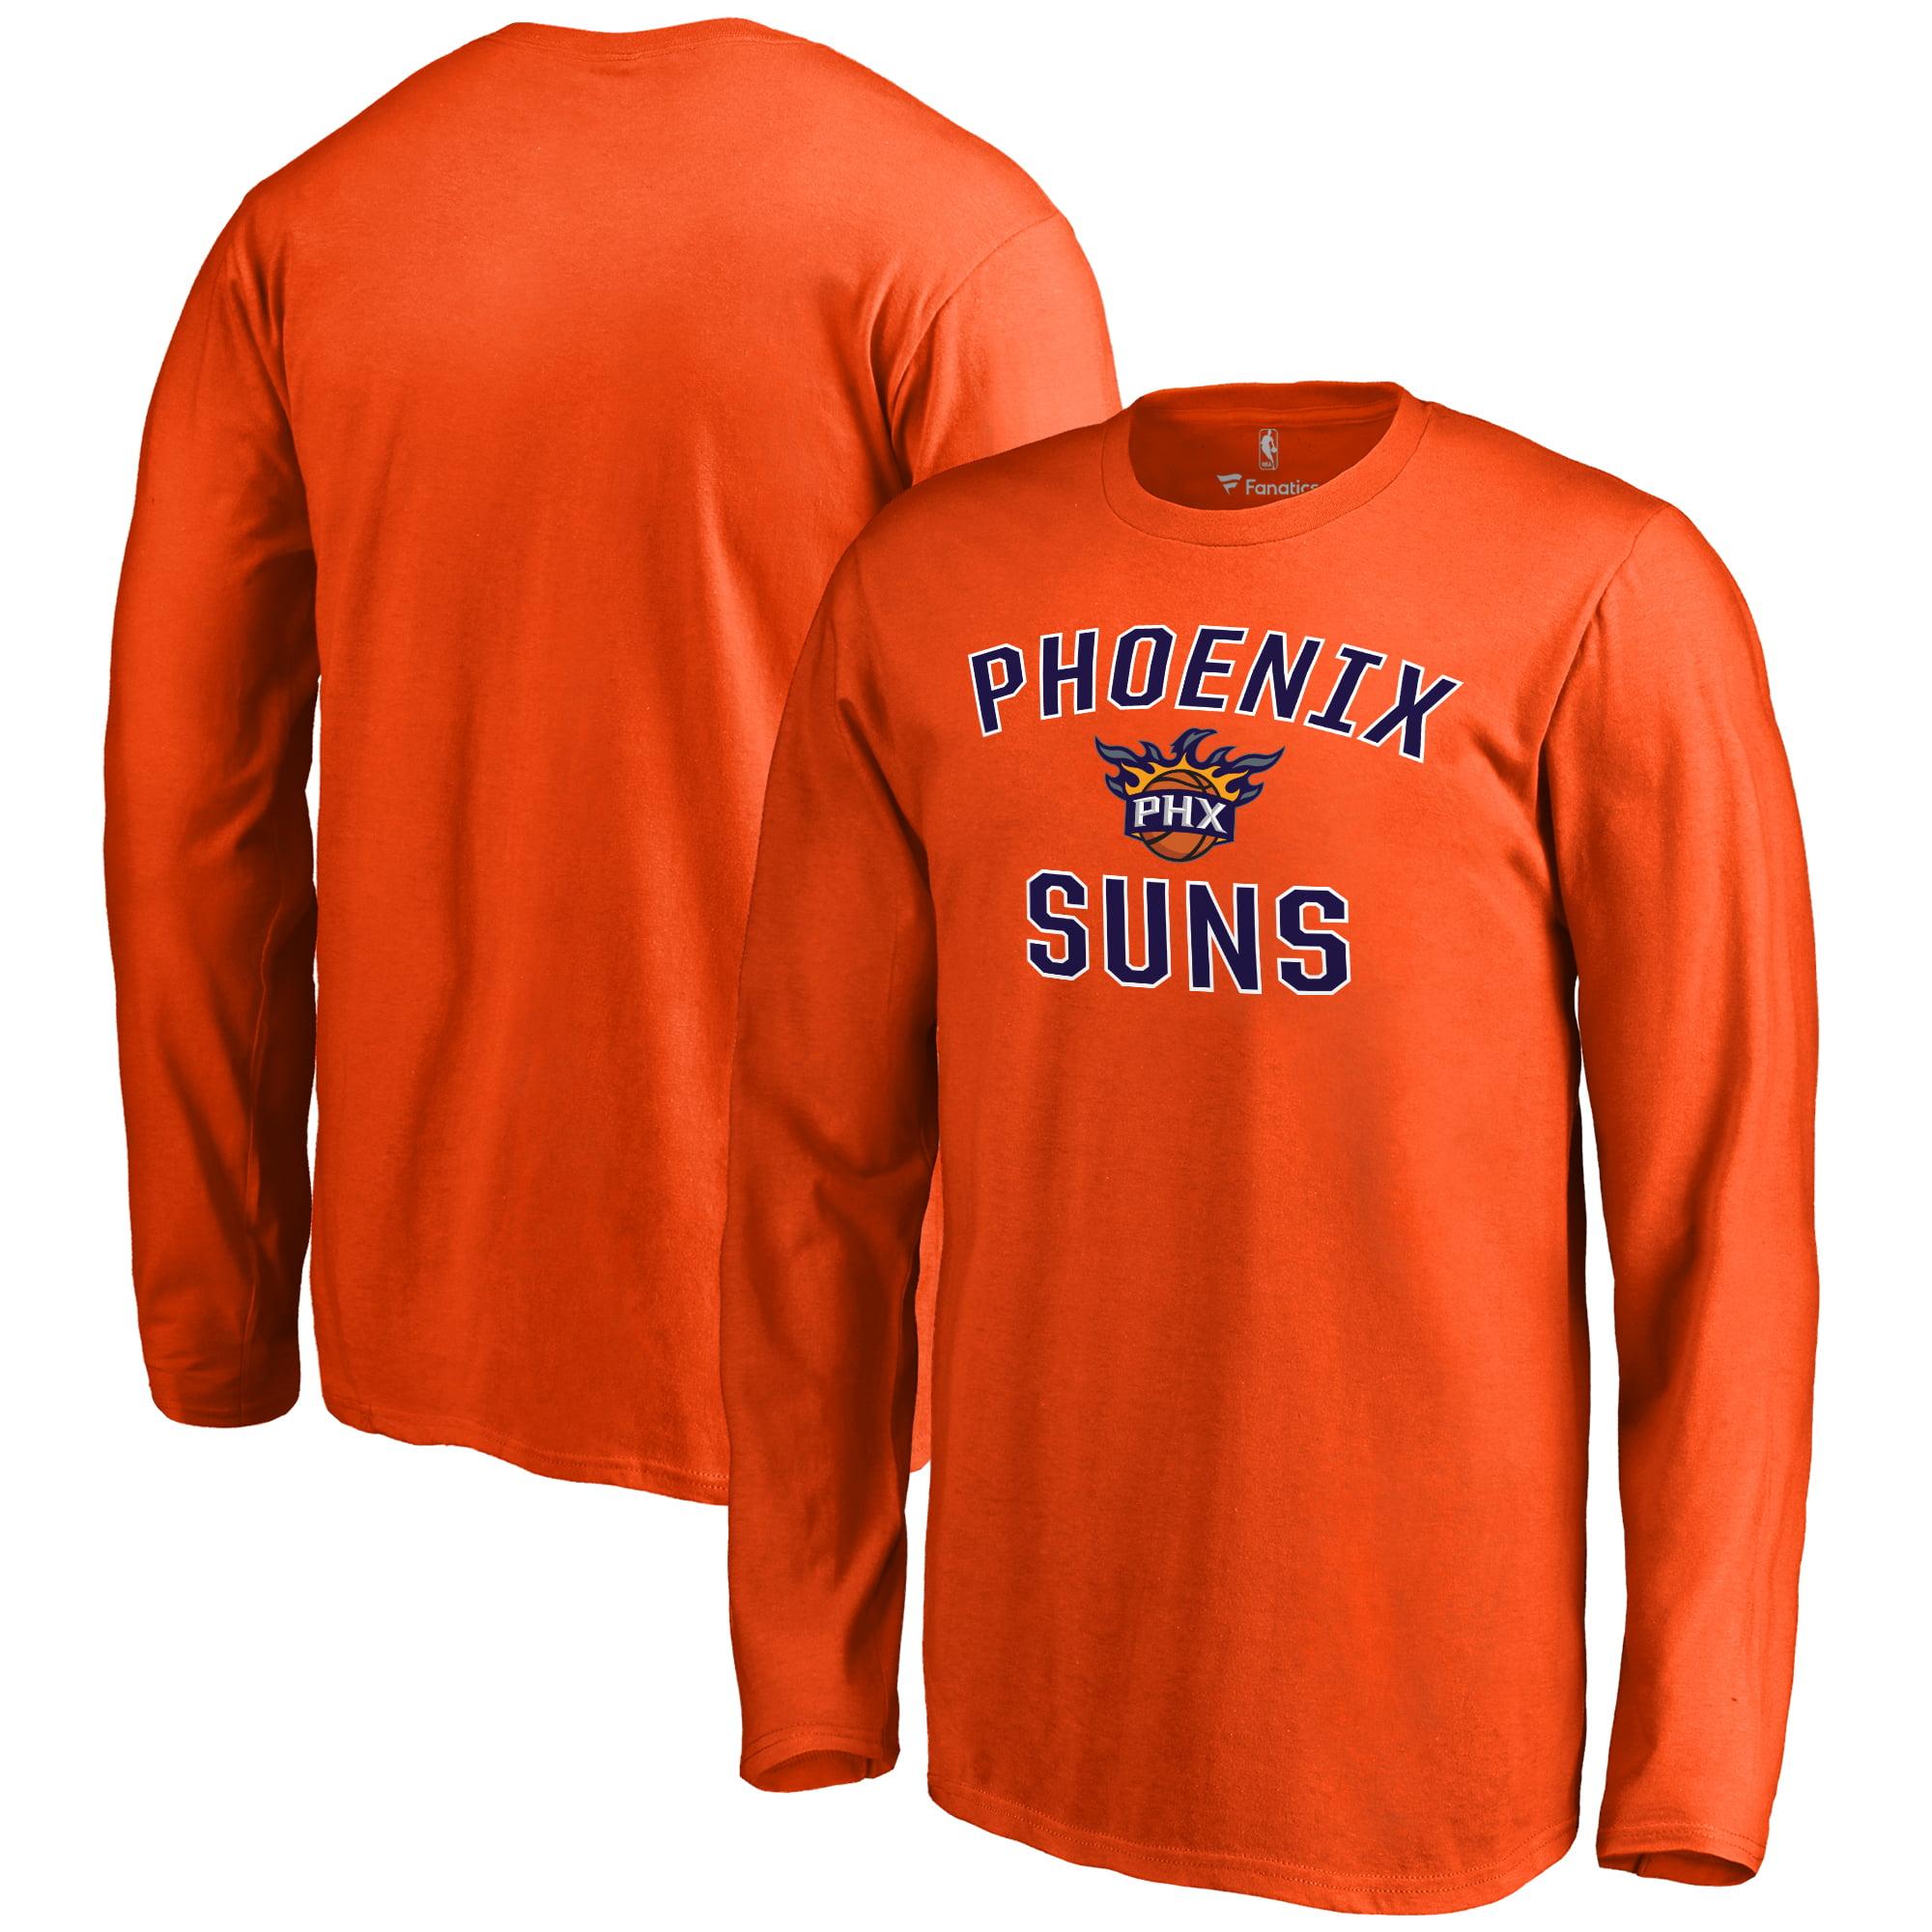 Phoenix Suns Youth Victory Arch Long Sleeve T-Shirt - Orange